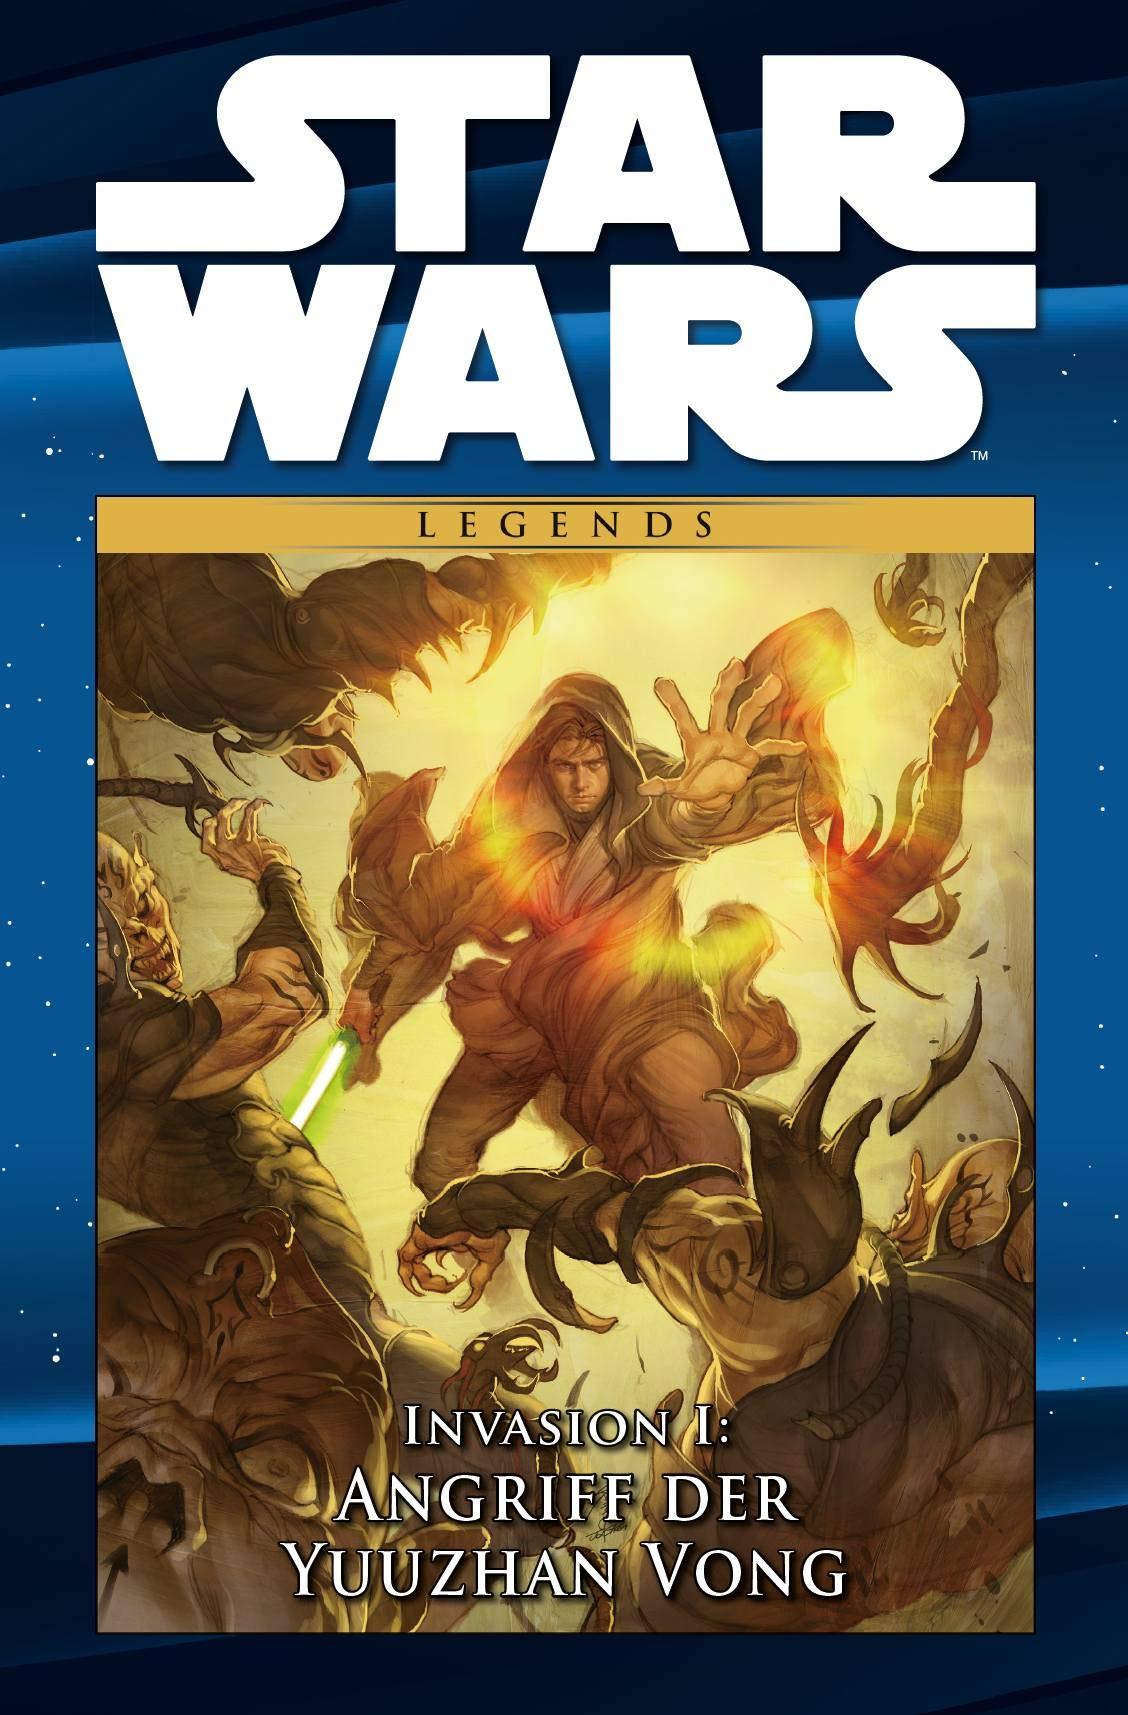 Star Wars Comic-Kollektion, Band 84: Invasion I: Angriff der Yuuzhan Vong (19.11.2019)